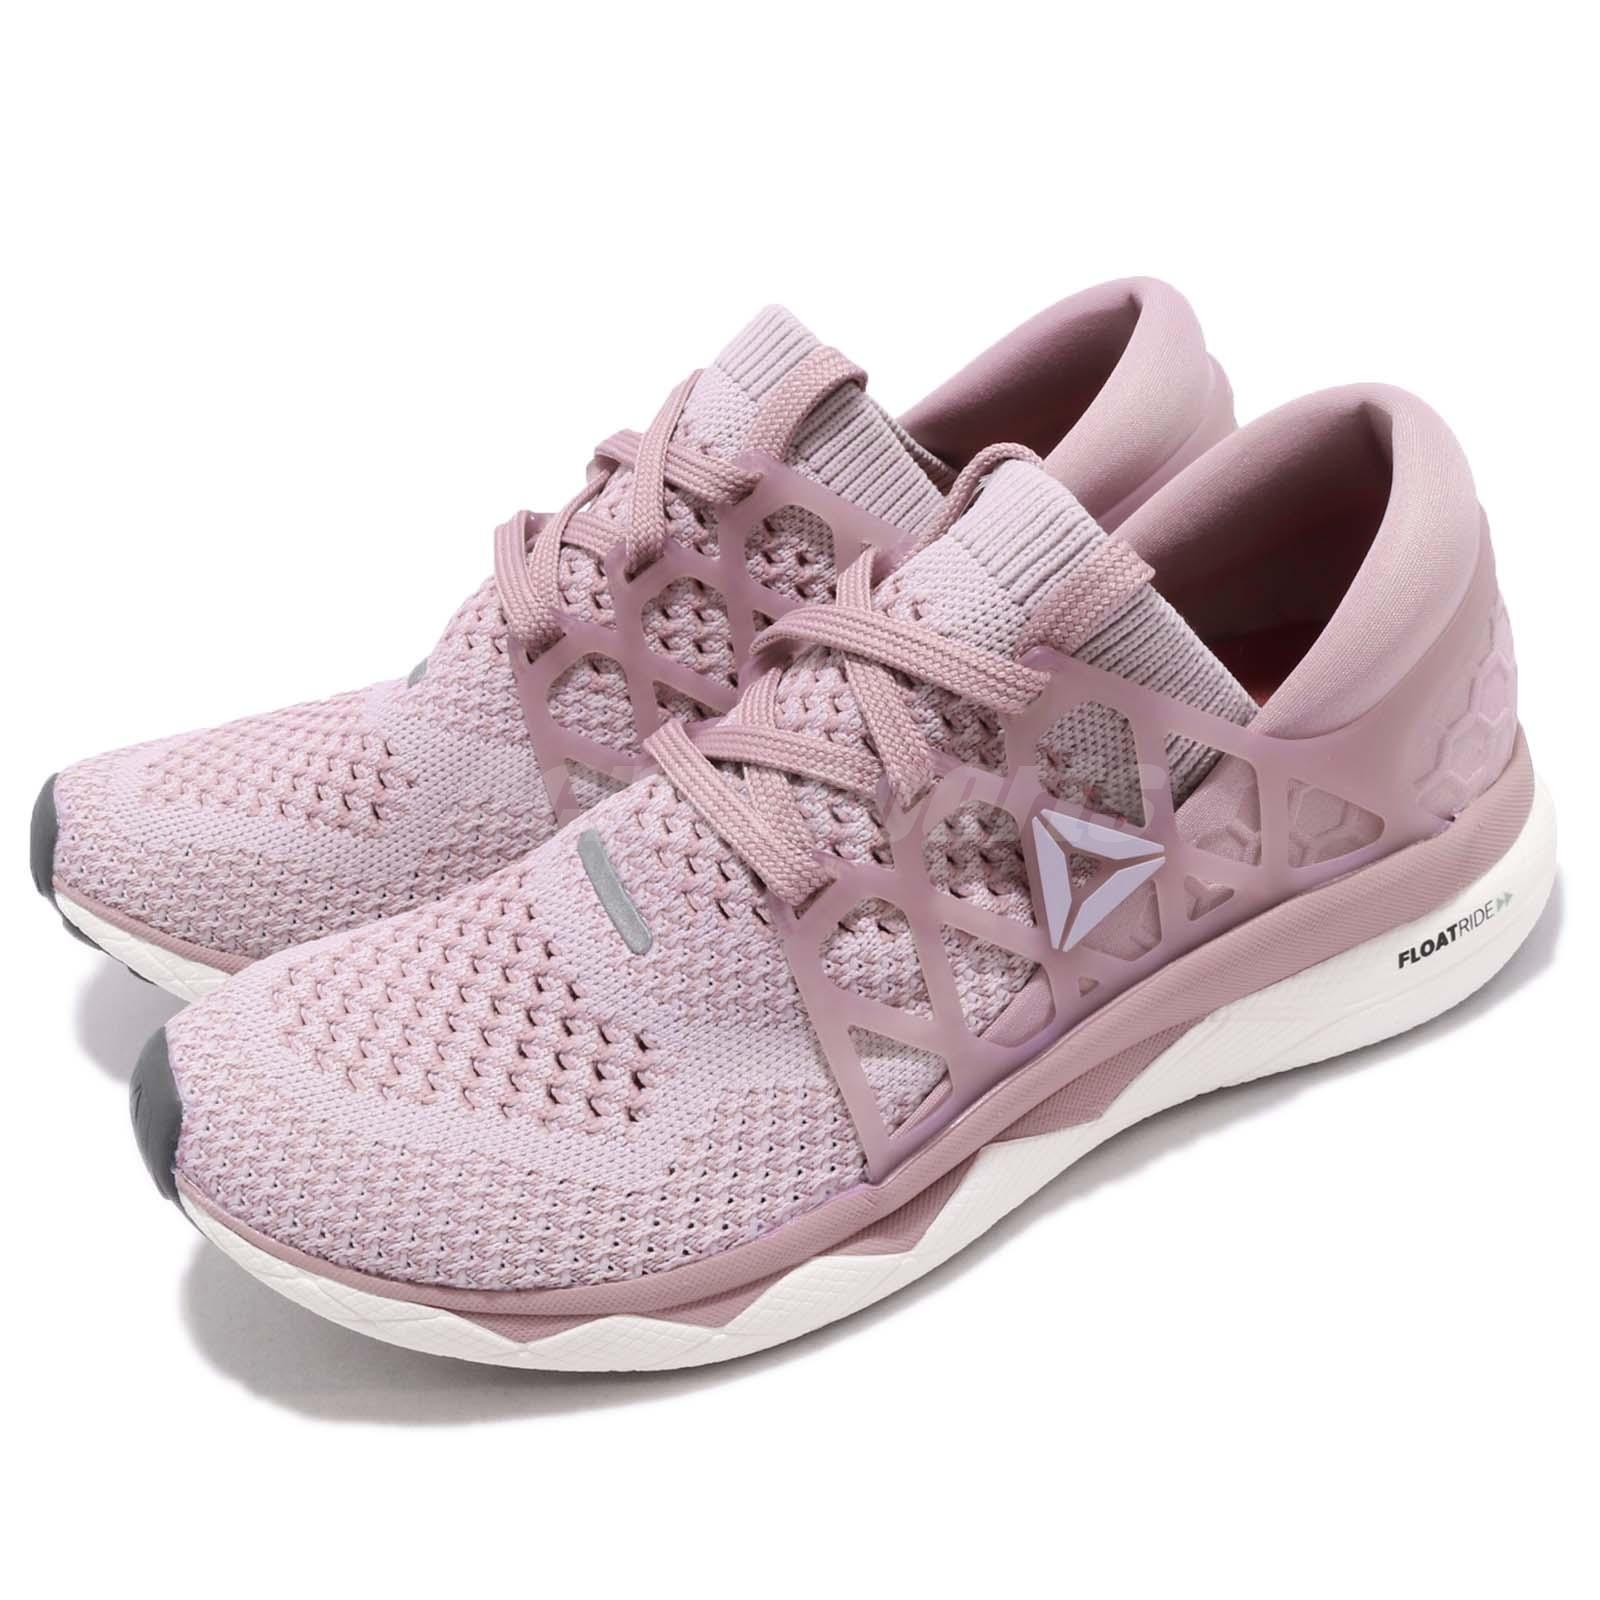 e5ee656c978471 Details about Reebok Floatride Run ULTK Ultraknit Lilac Berry White Women  Running Shoes CN2590